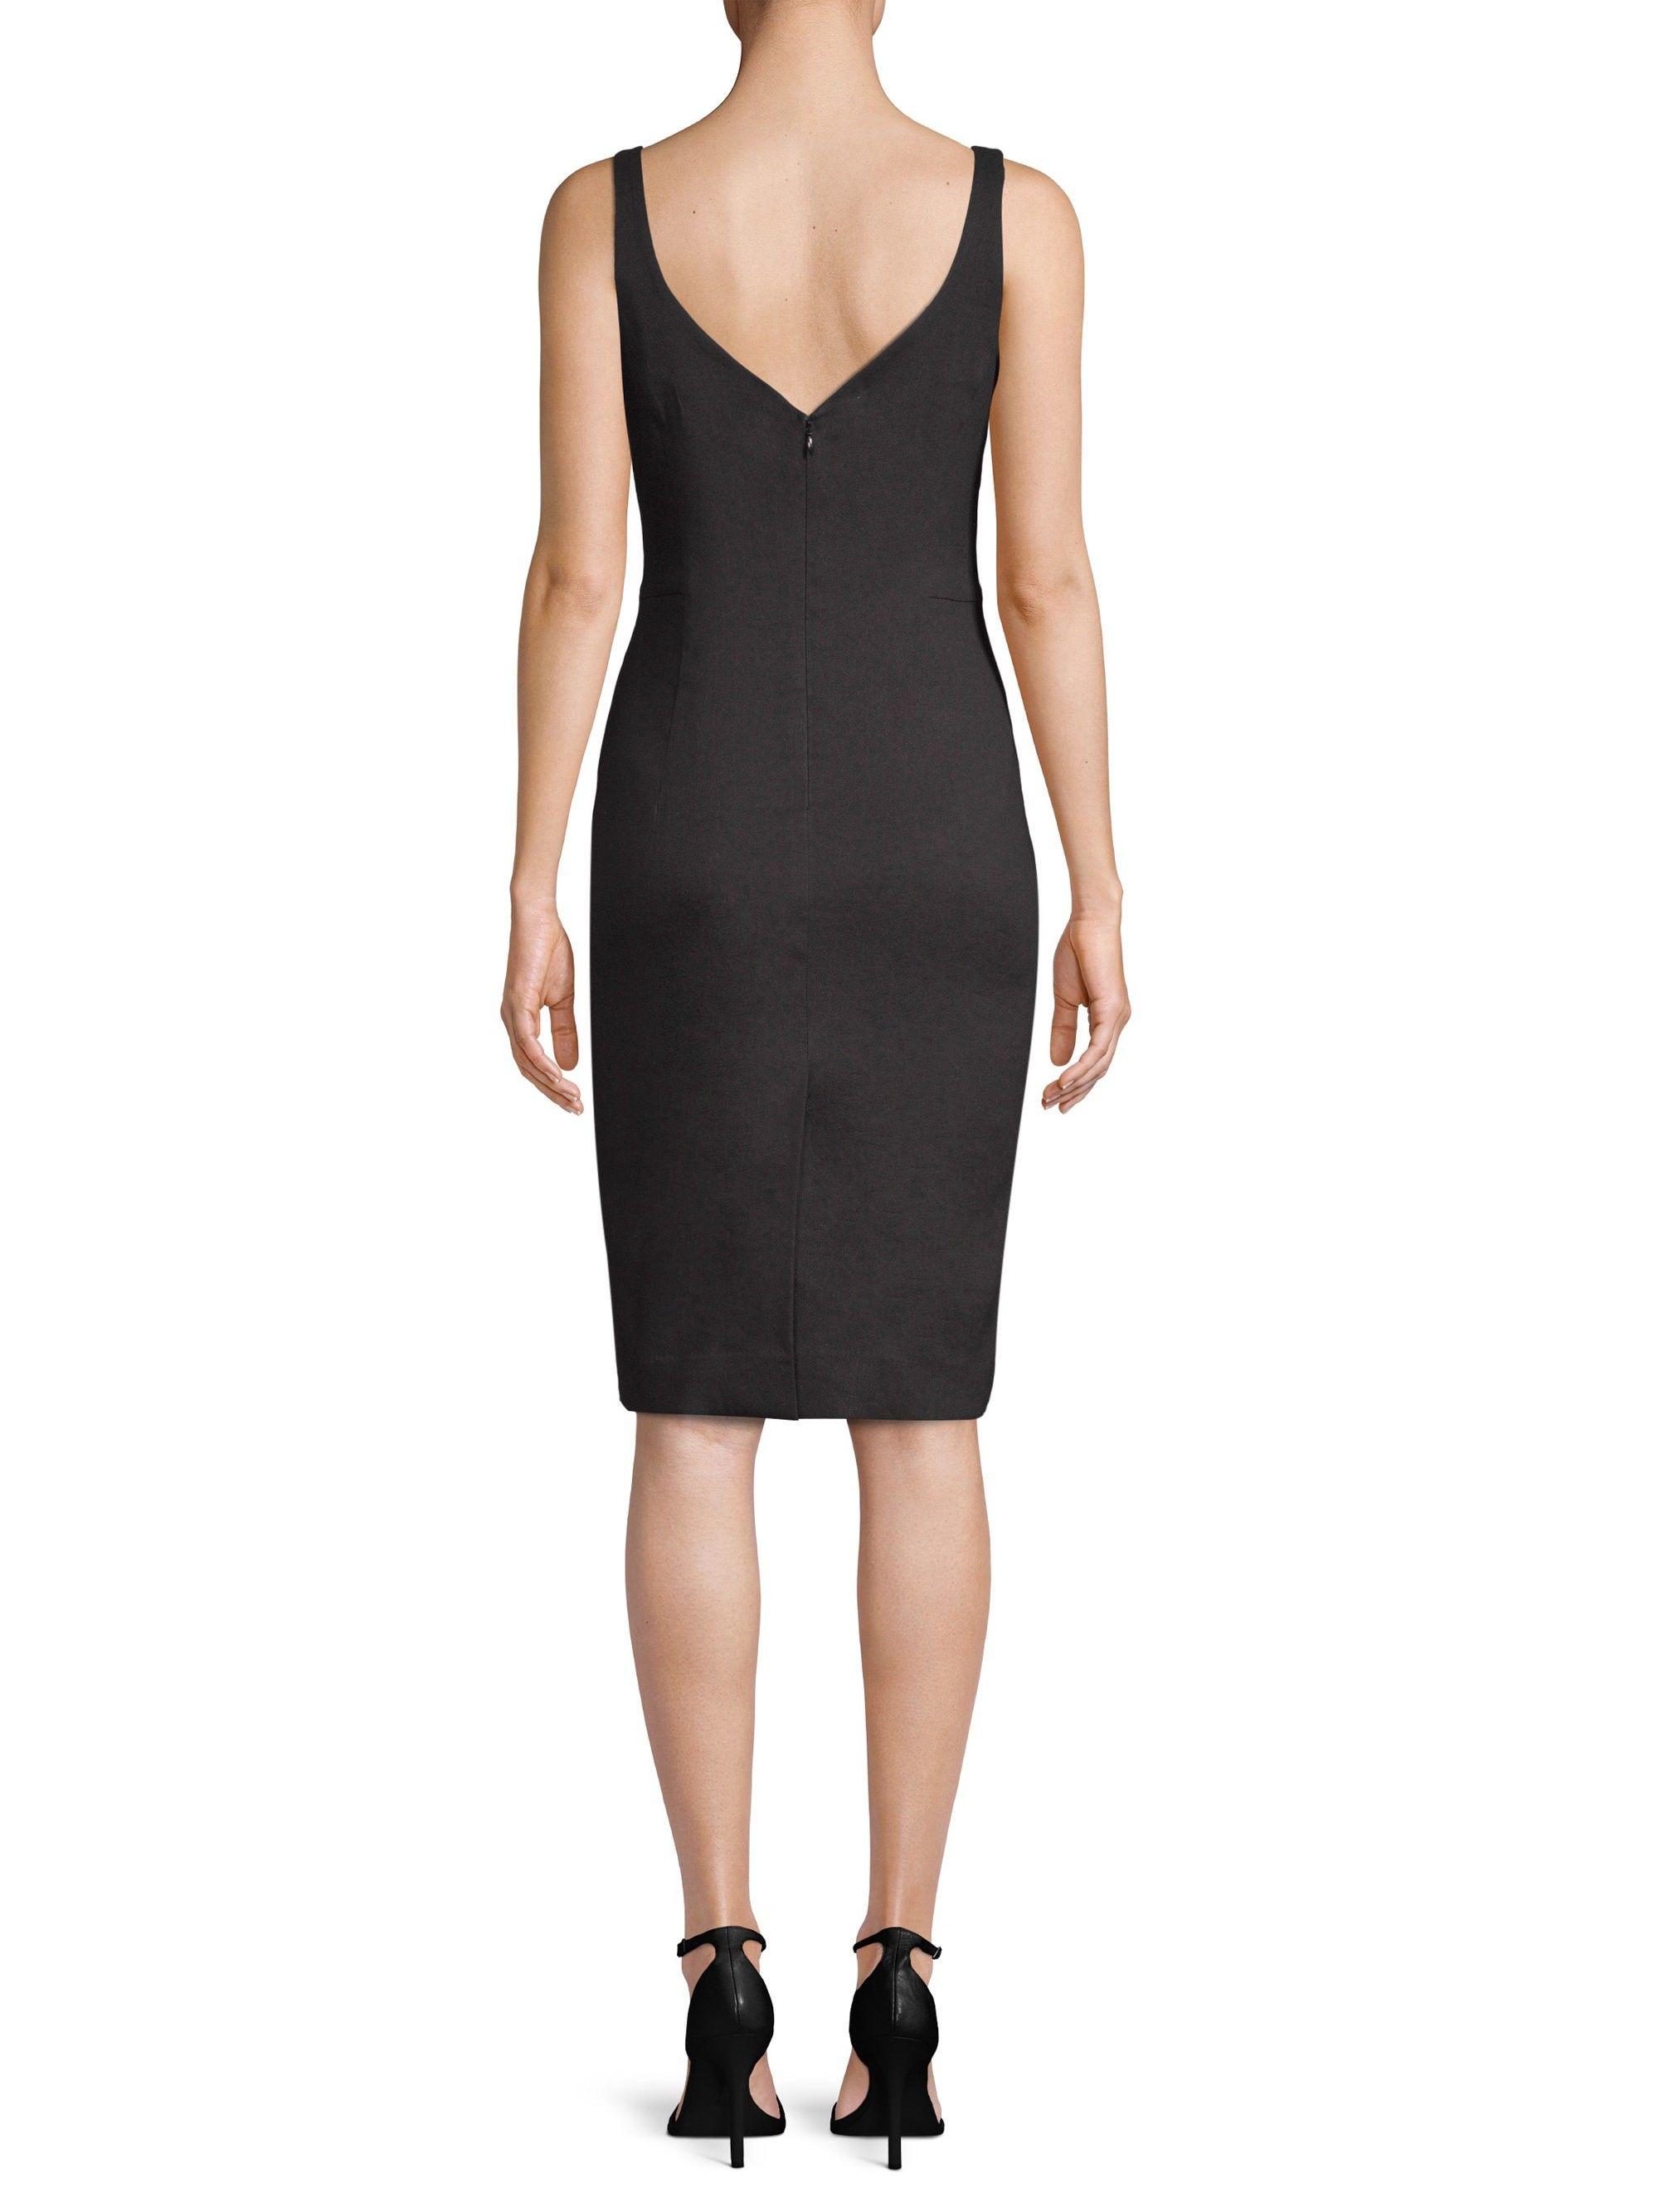 05097164 Milly Elizabeth Linen Dress - Black 10 Linen Dresses, Sheath Dress, Dress  Black,